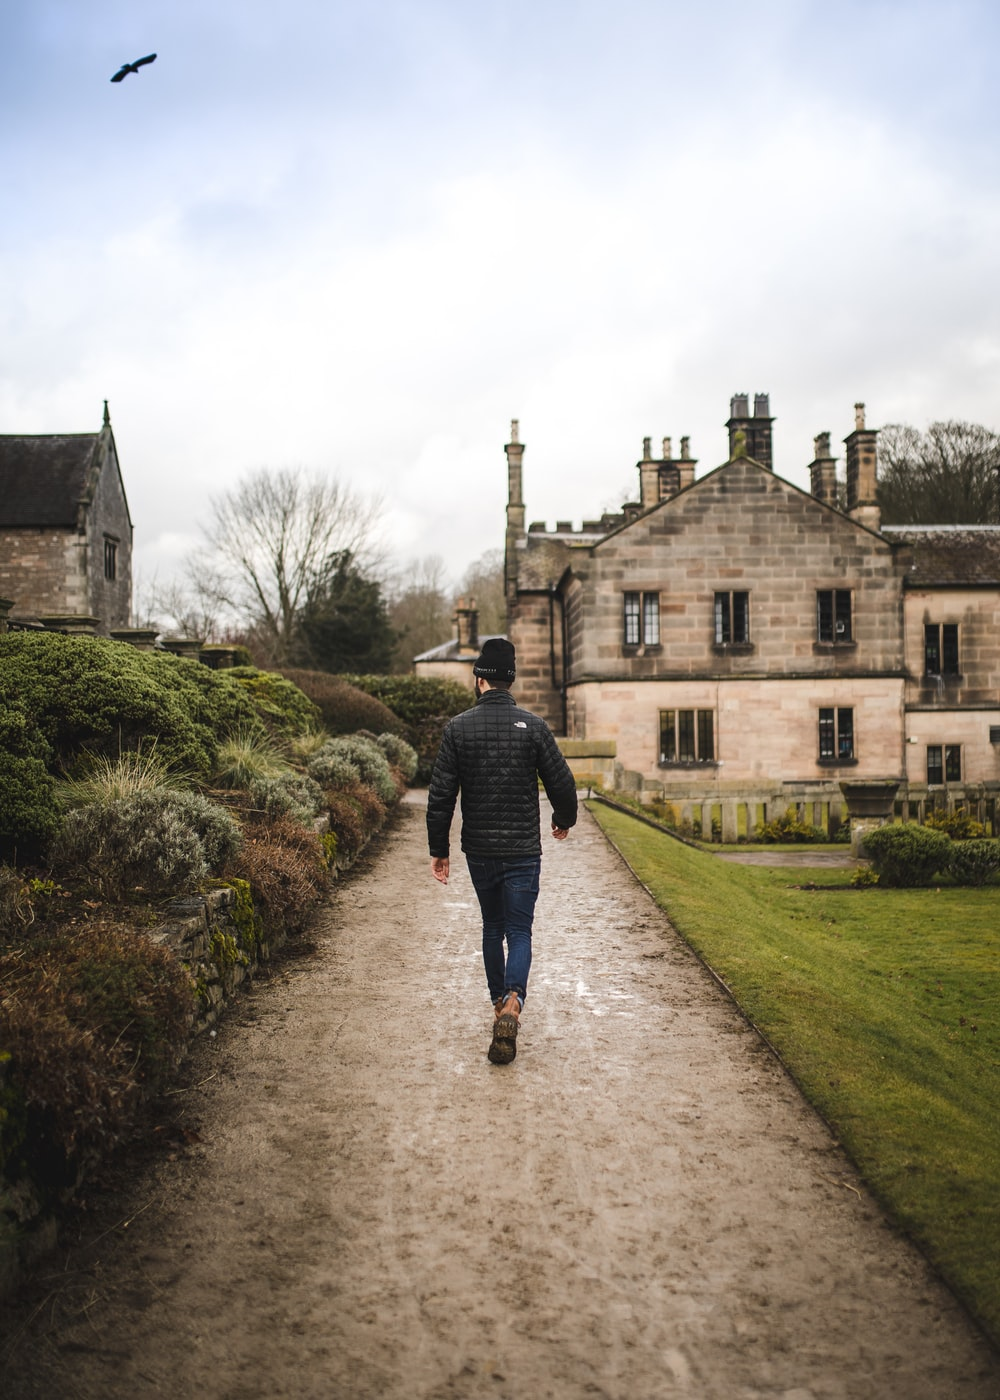 man walking on dirt road near brick house during daytime